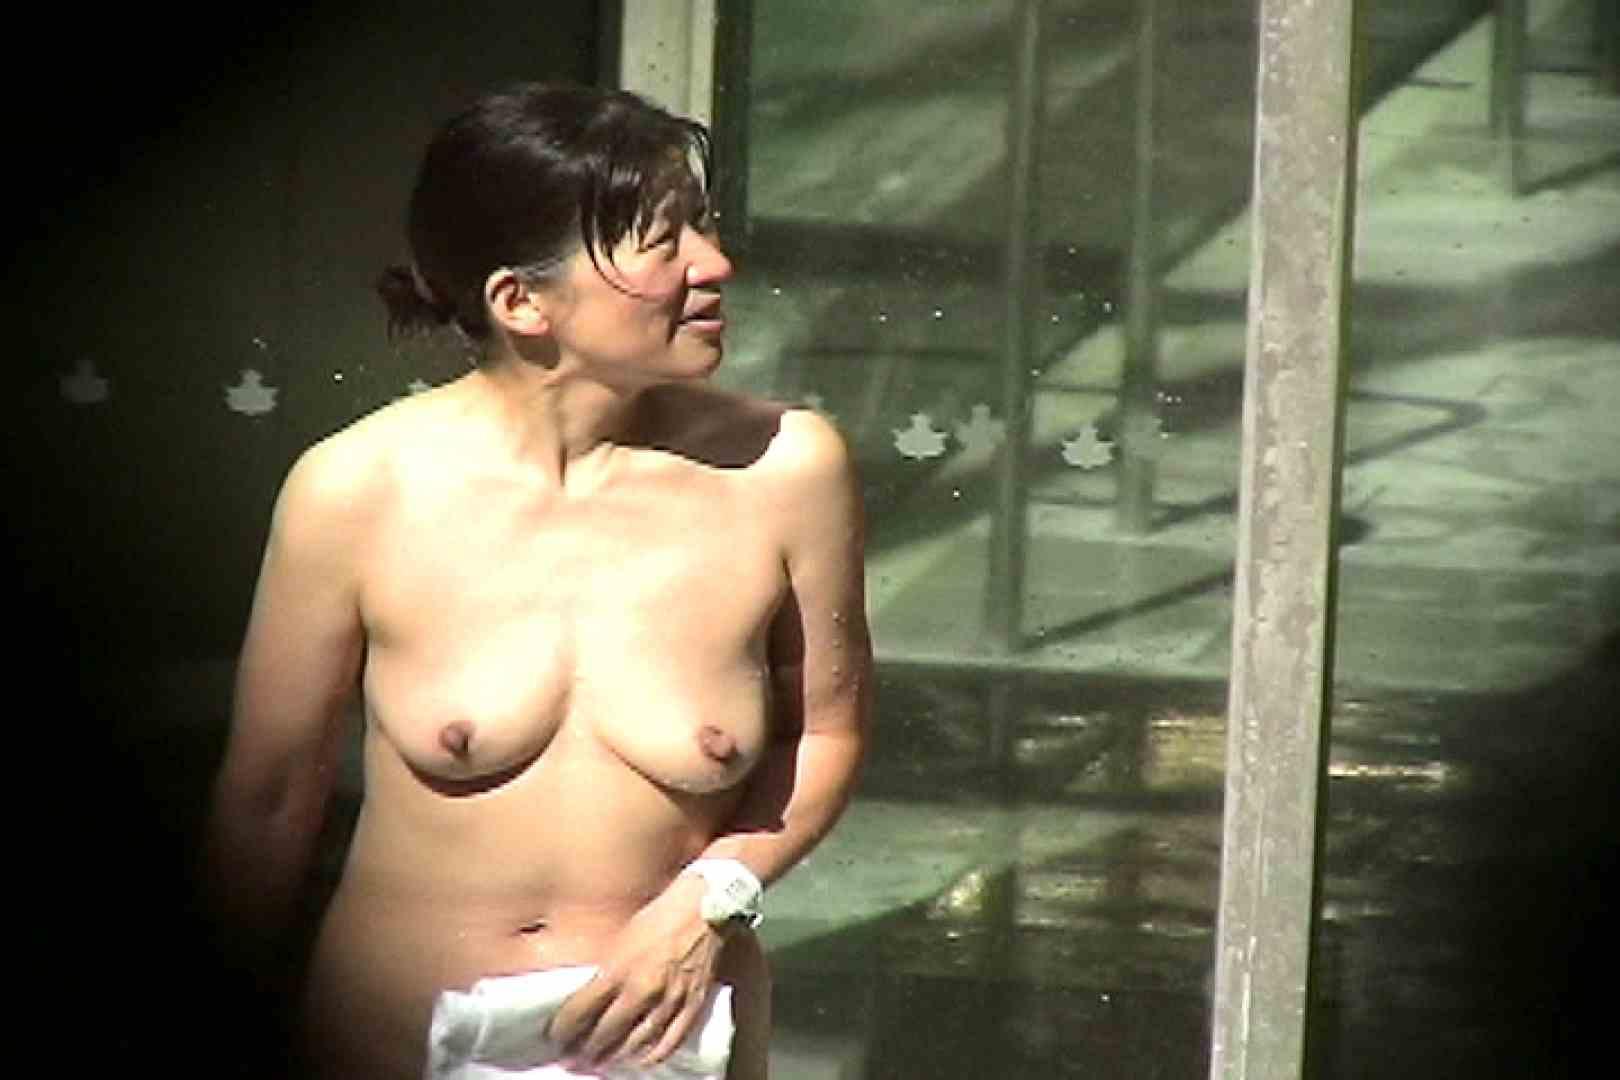 Aquaな露天風呂Vol.453 0  66連発 16